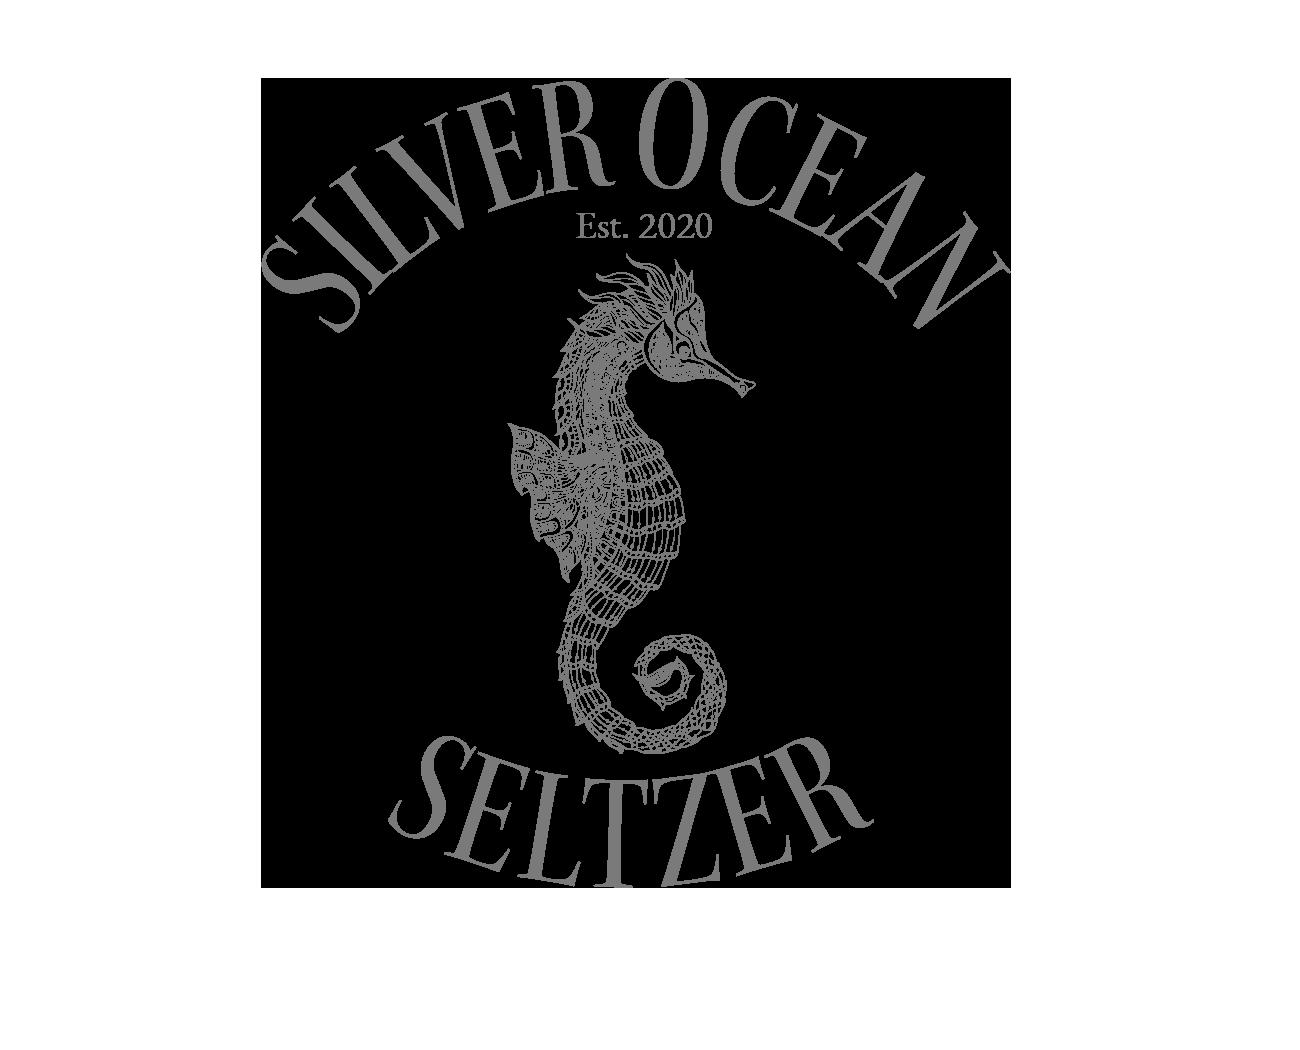 Silver Ocean Club